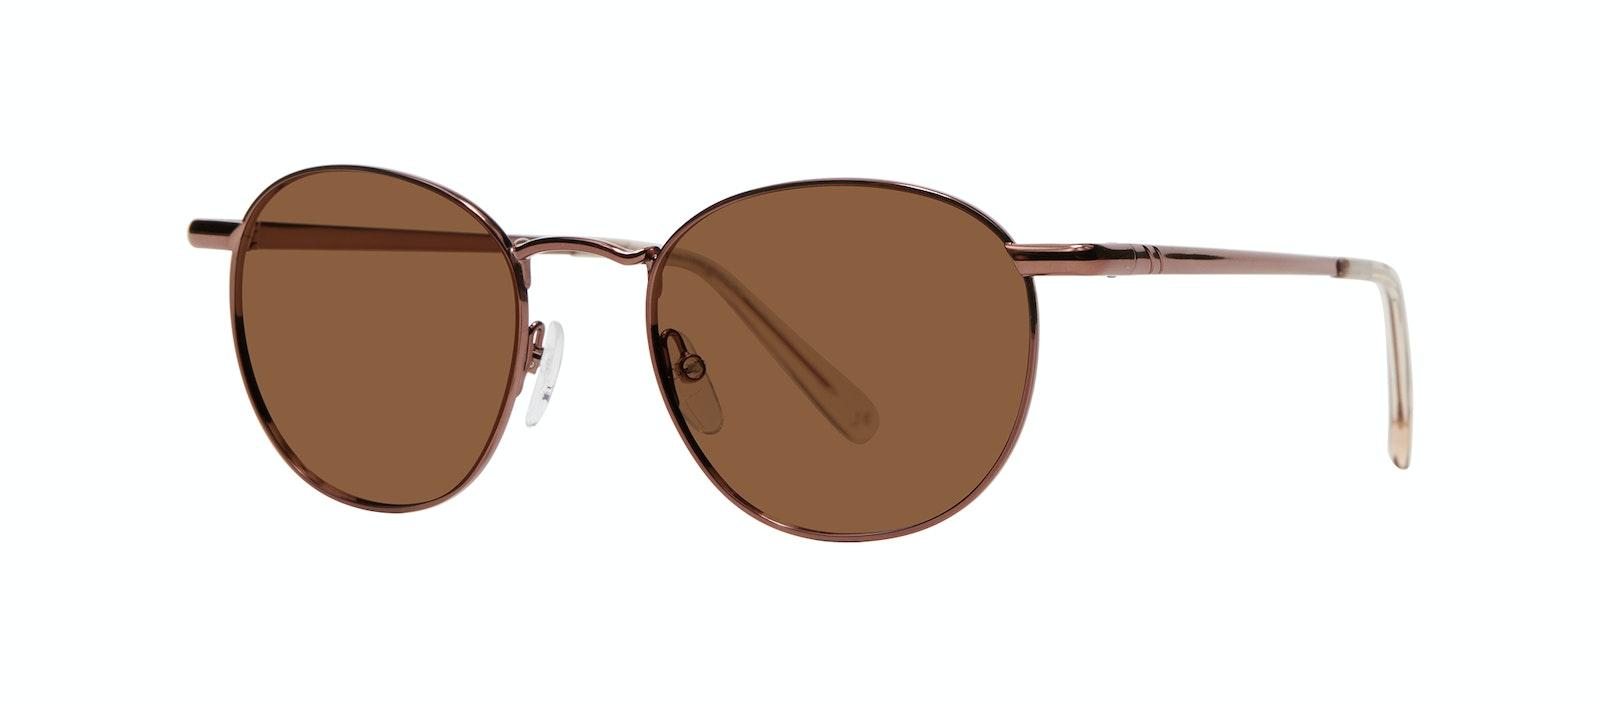 Affordable Fashion Glasses Round Sunglasses Men Women Divine M Copper Tilt